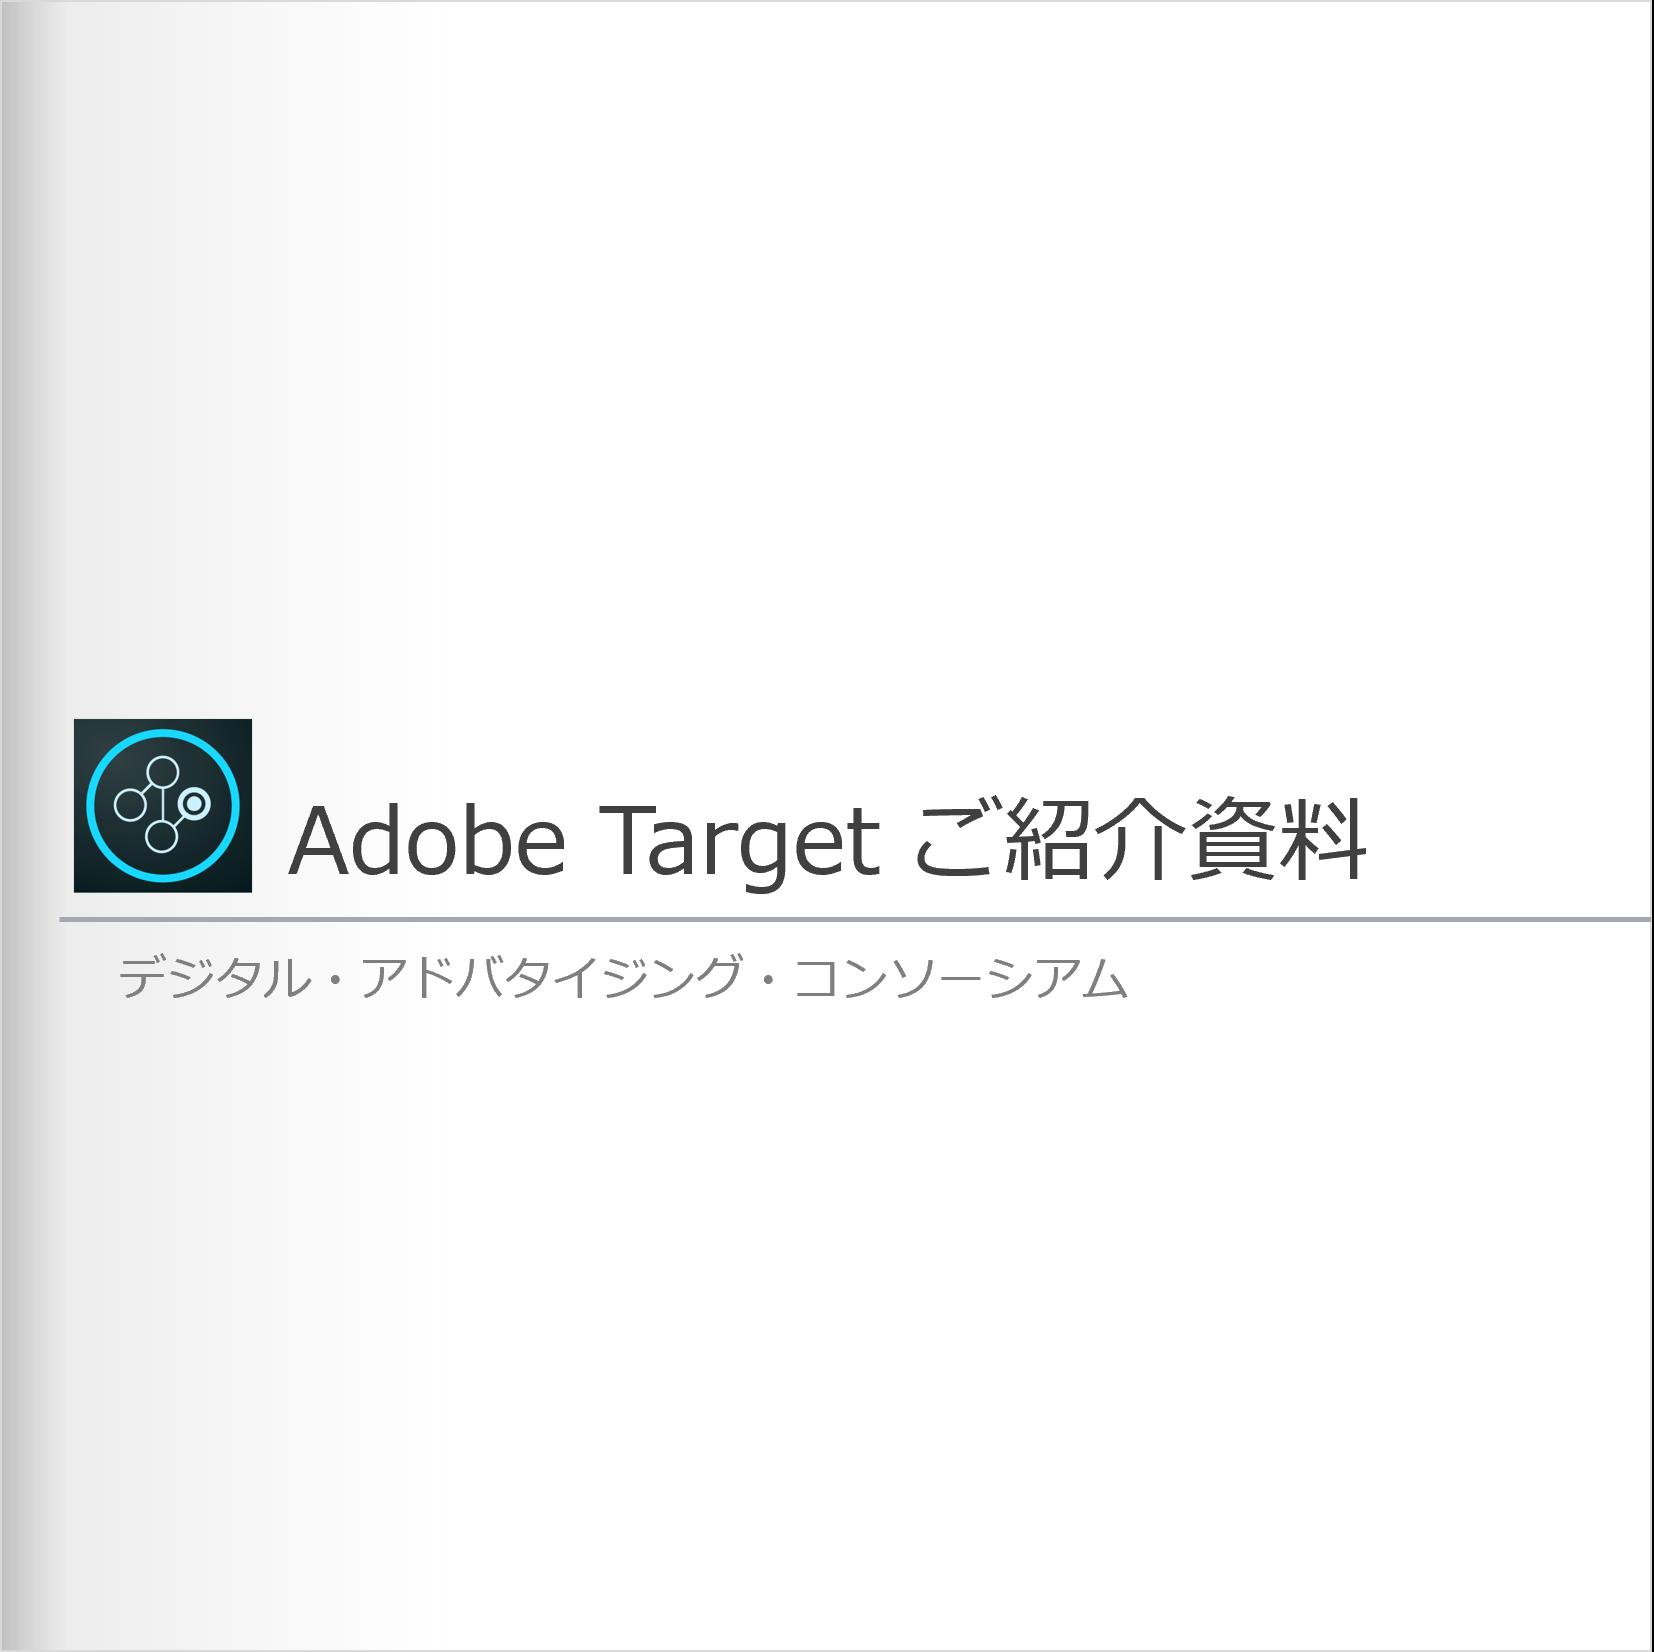 Adobe Target ご紹介資料